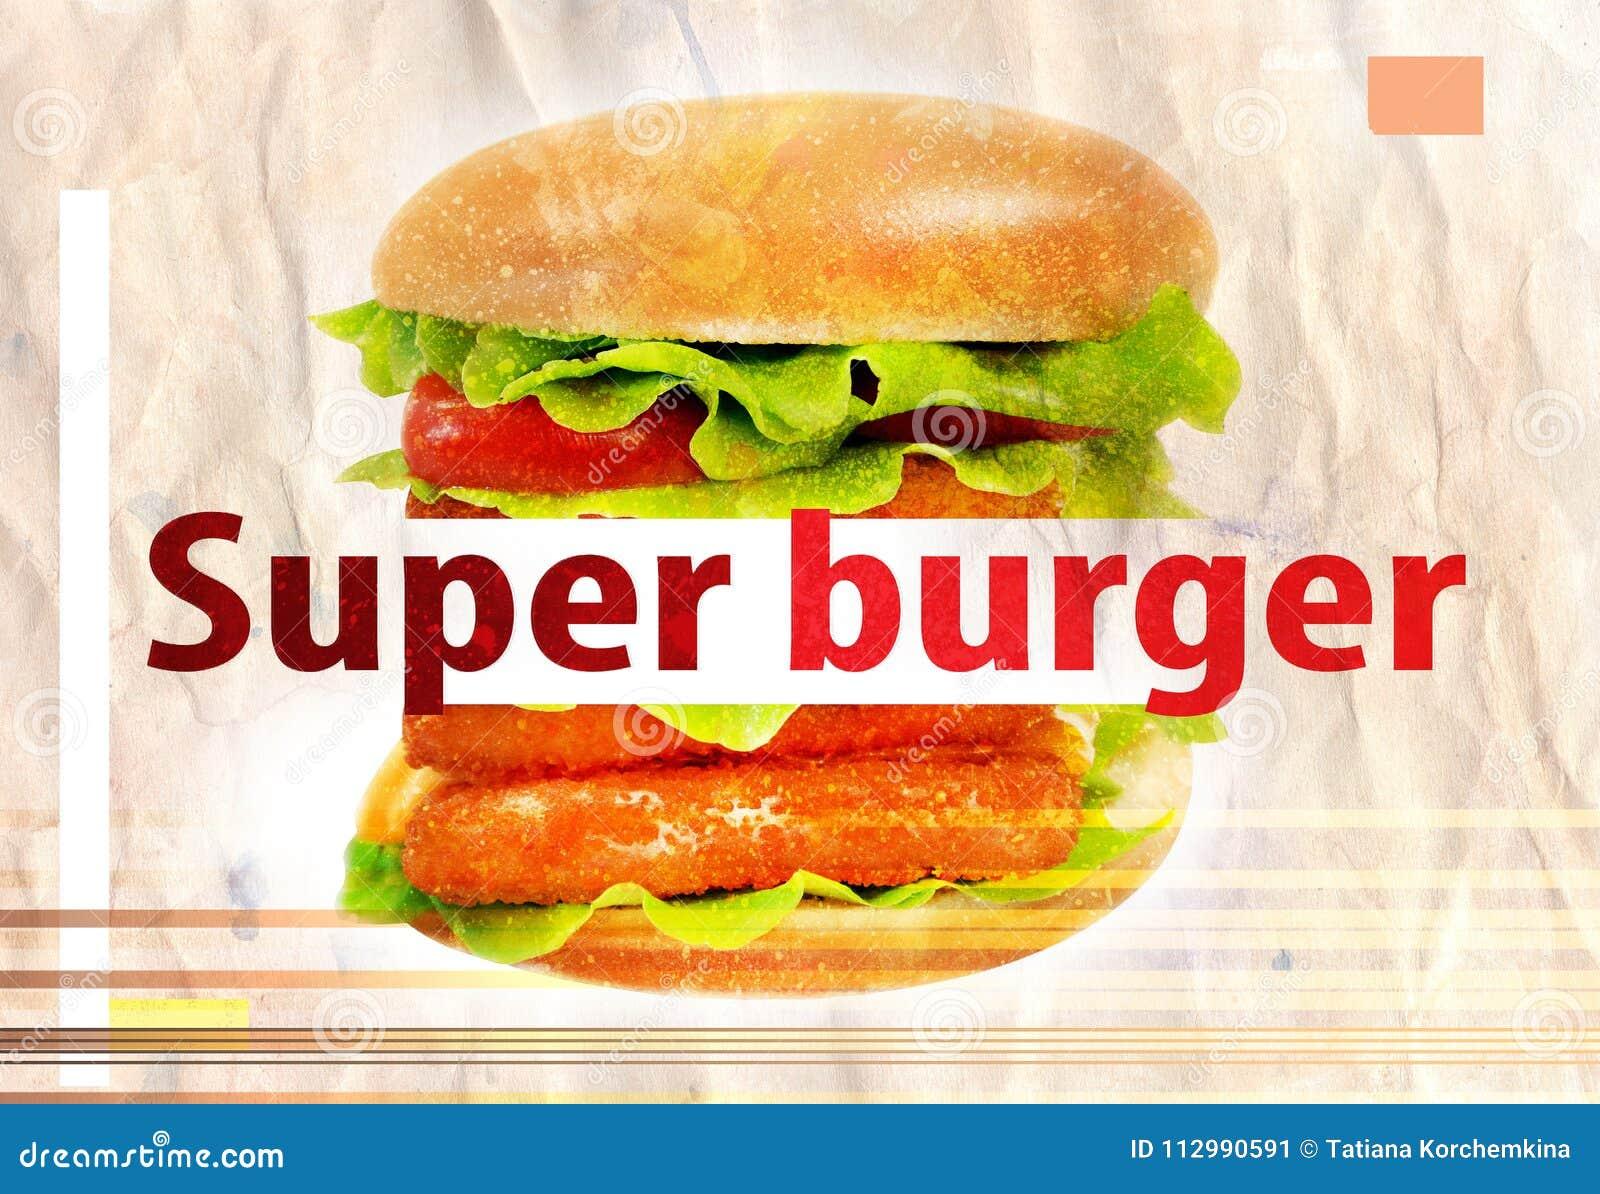 Photos big tasty burger with fish